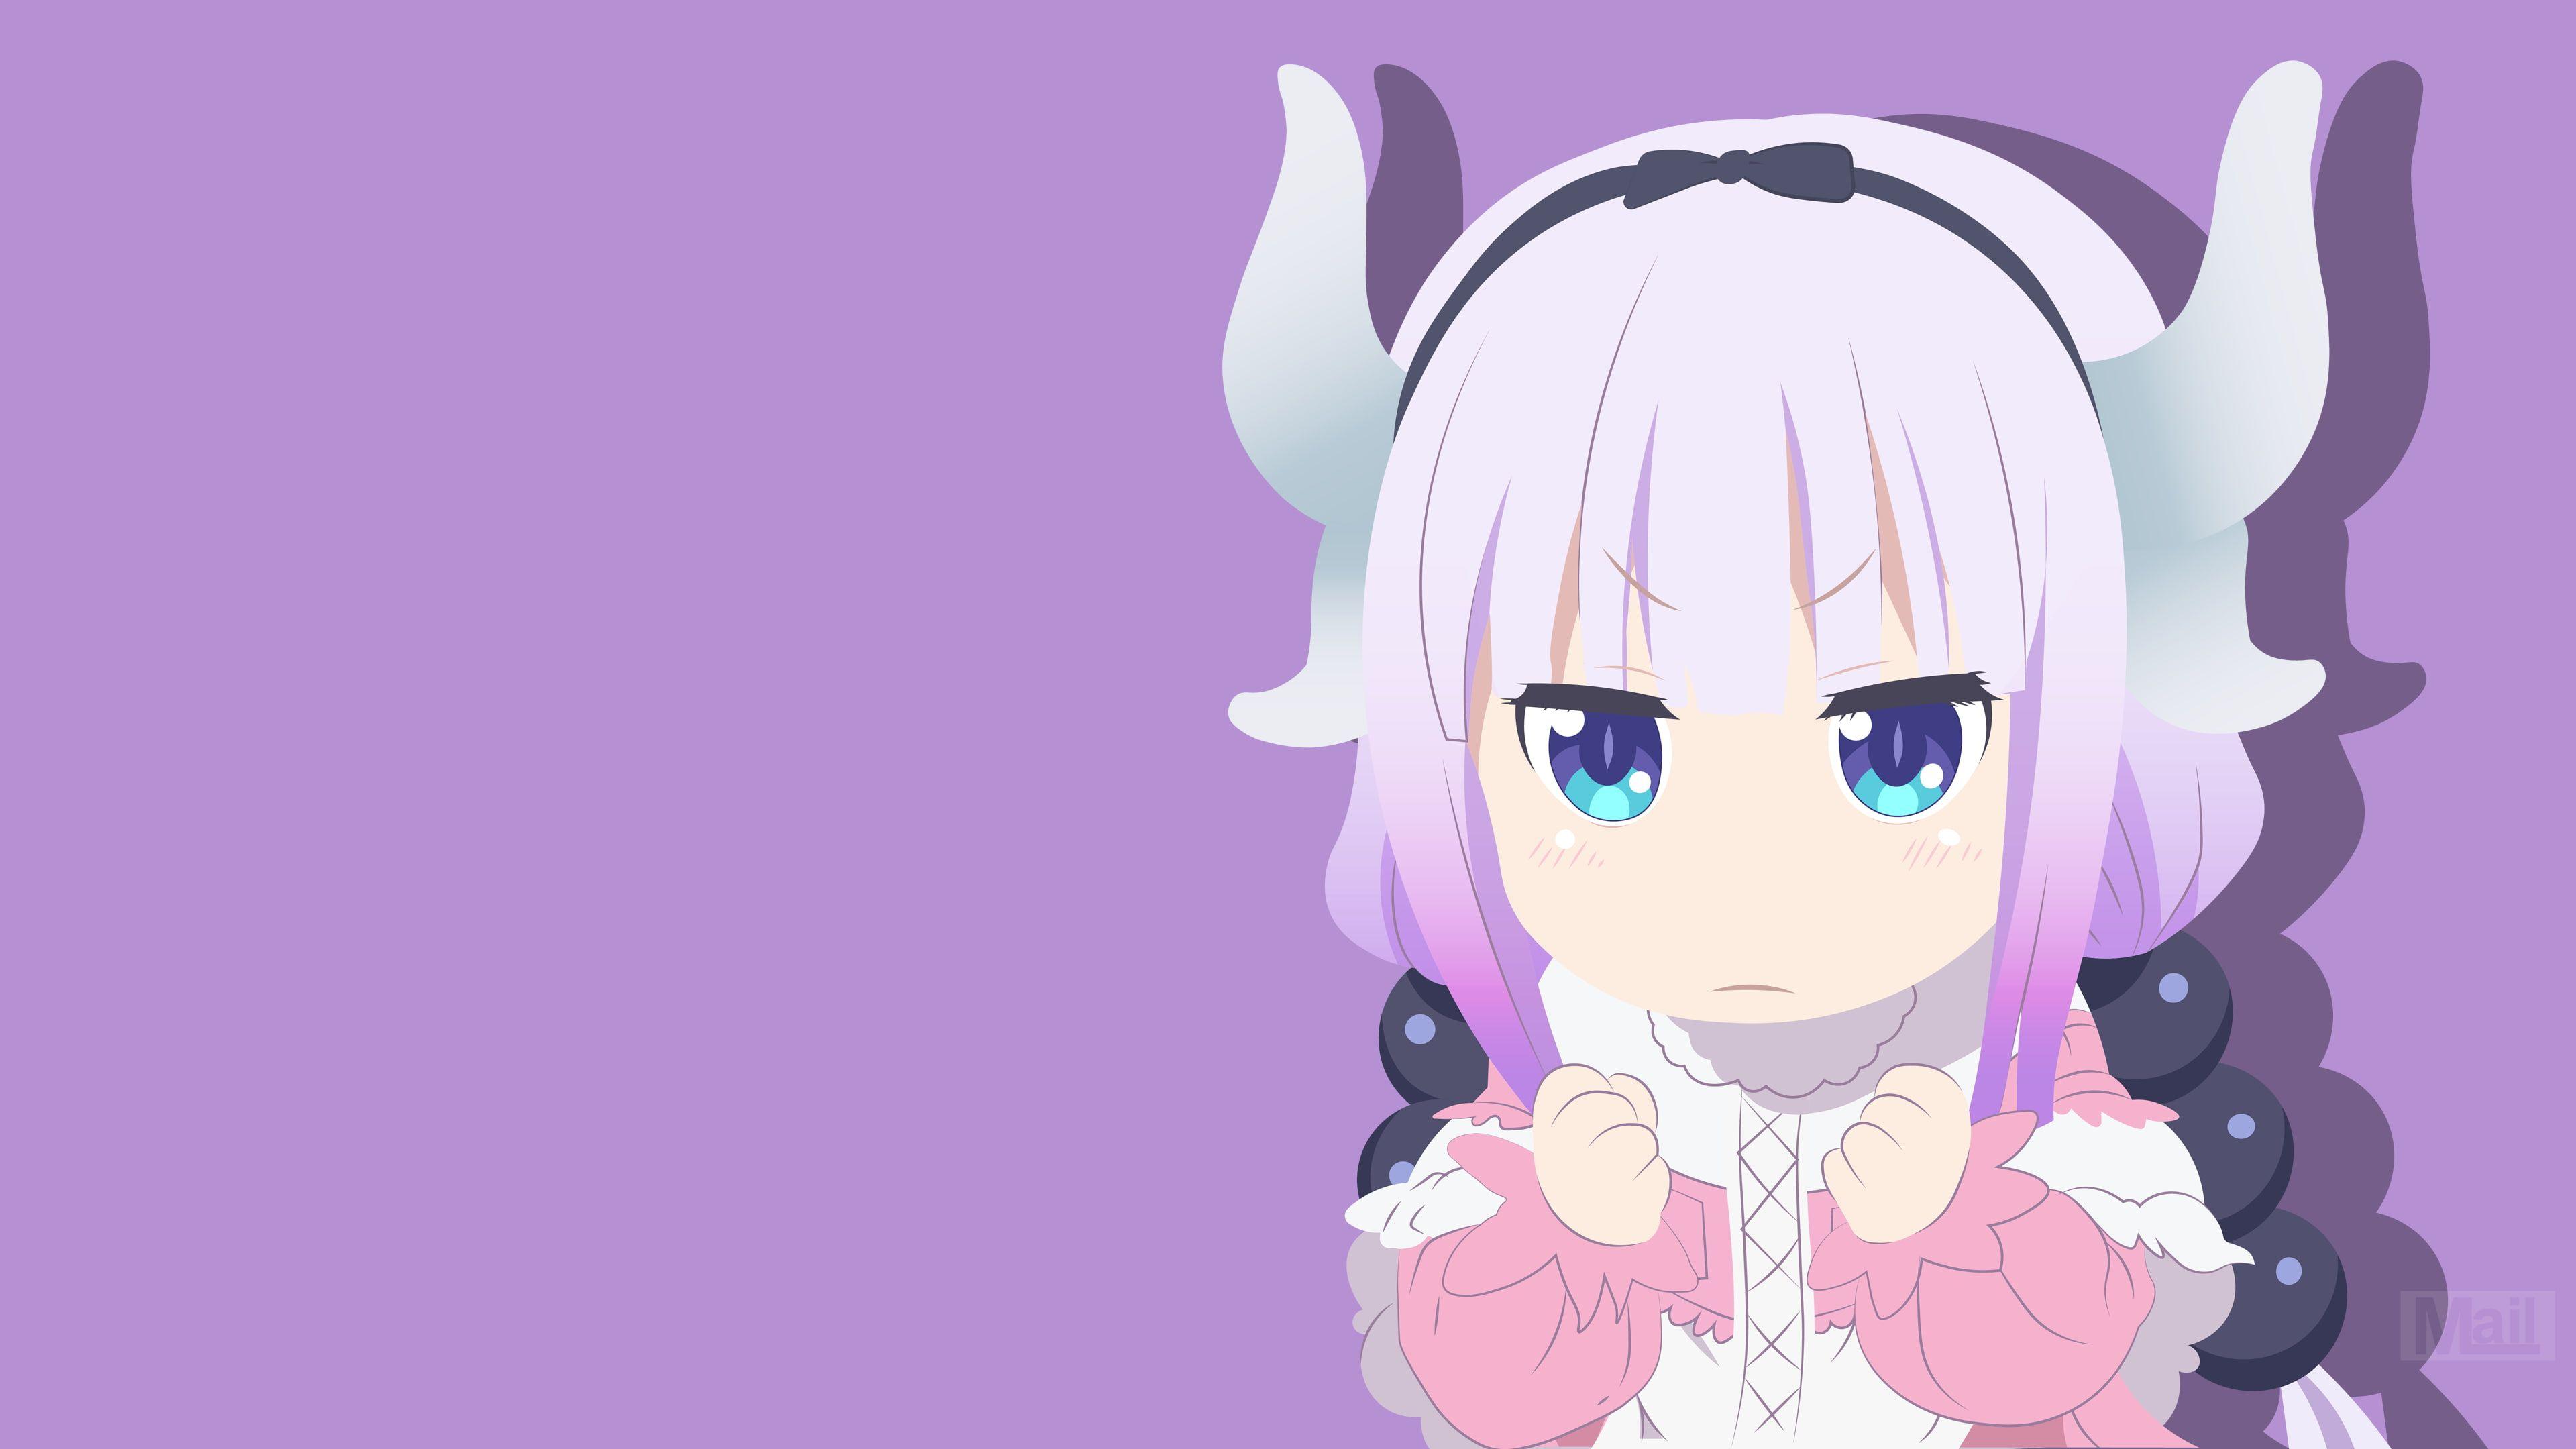 Top 13 most Kawai/Cute Anime Girls